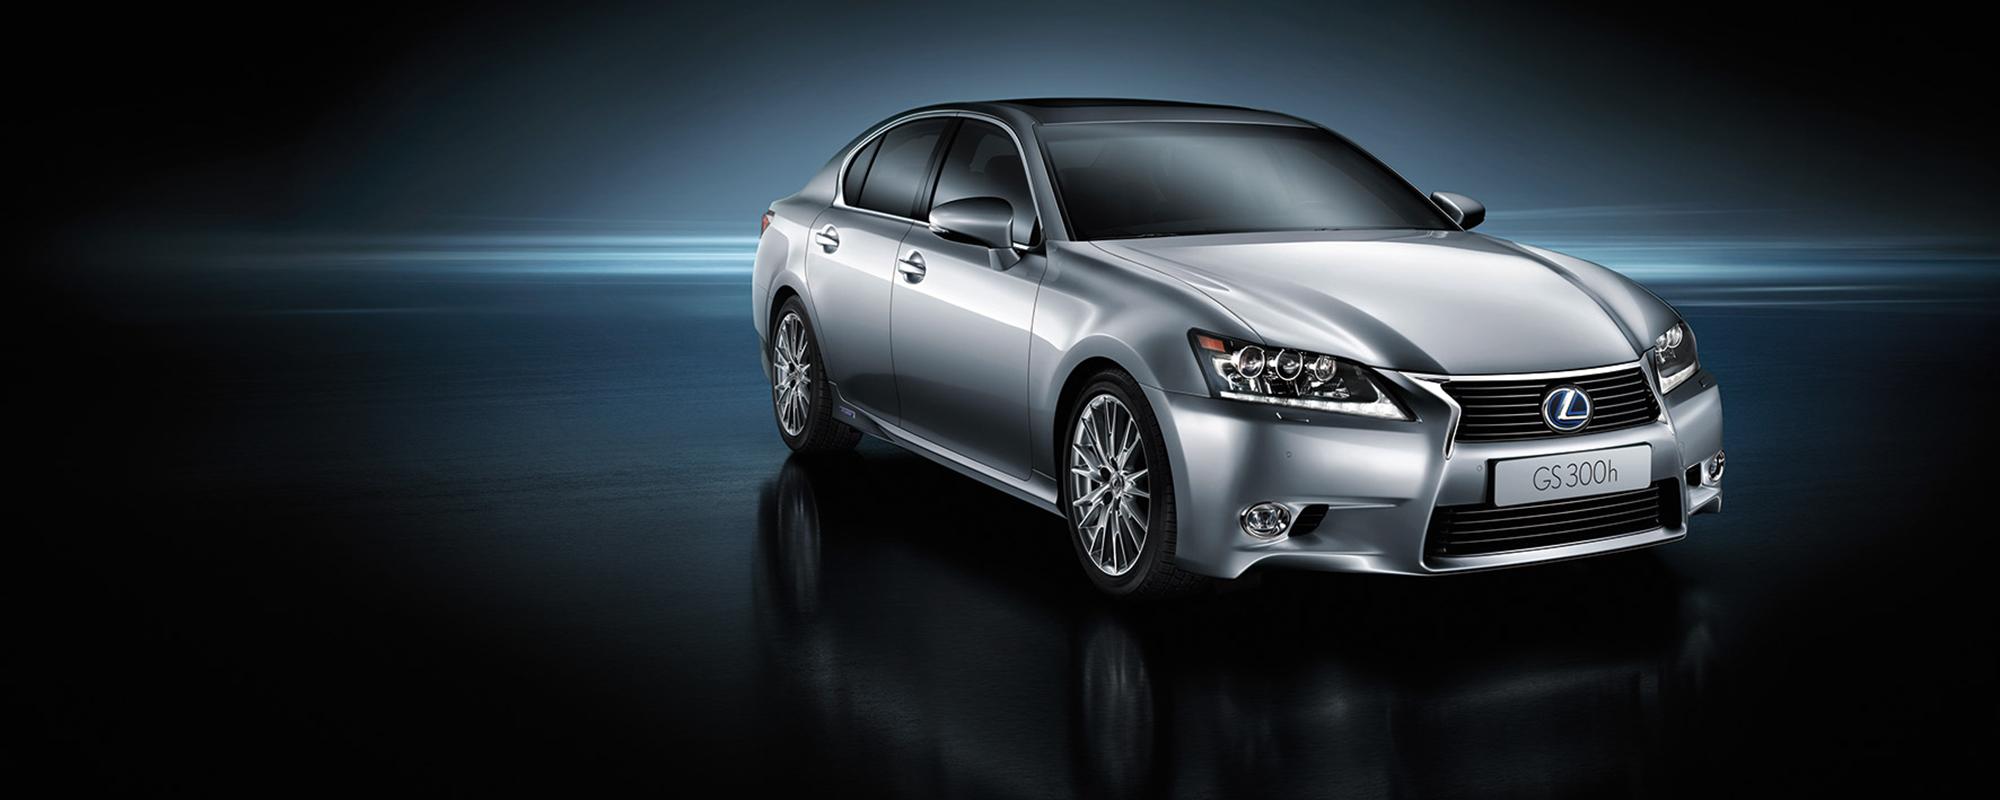 Lexus GS 300h Hybrid: 20% bijtelling vanaf 46.390 euro